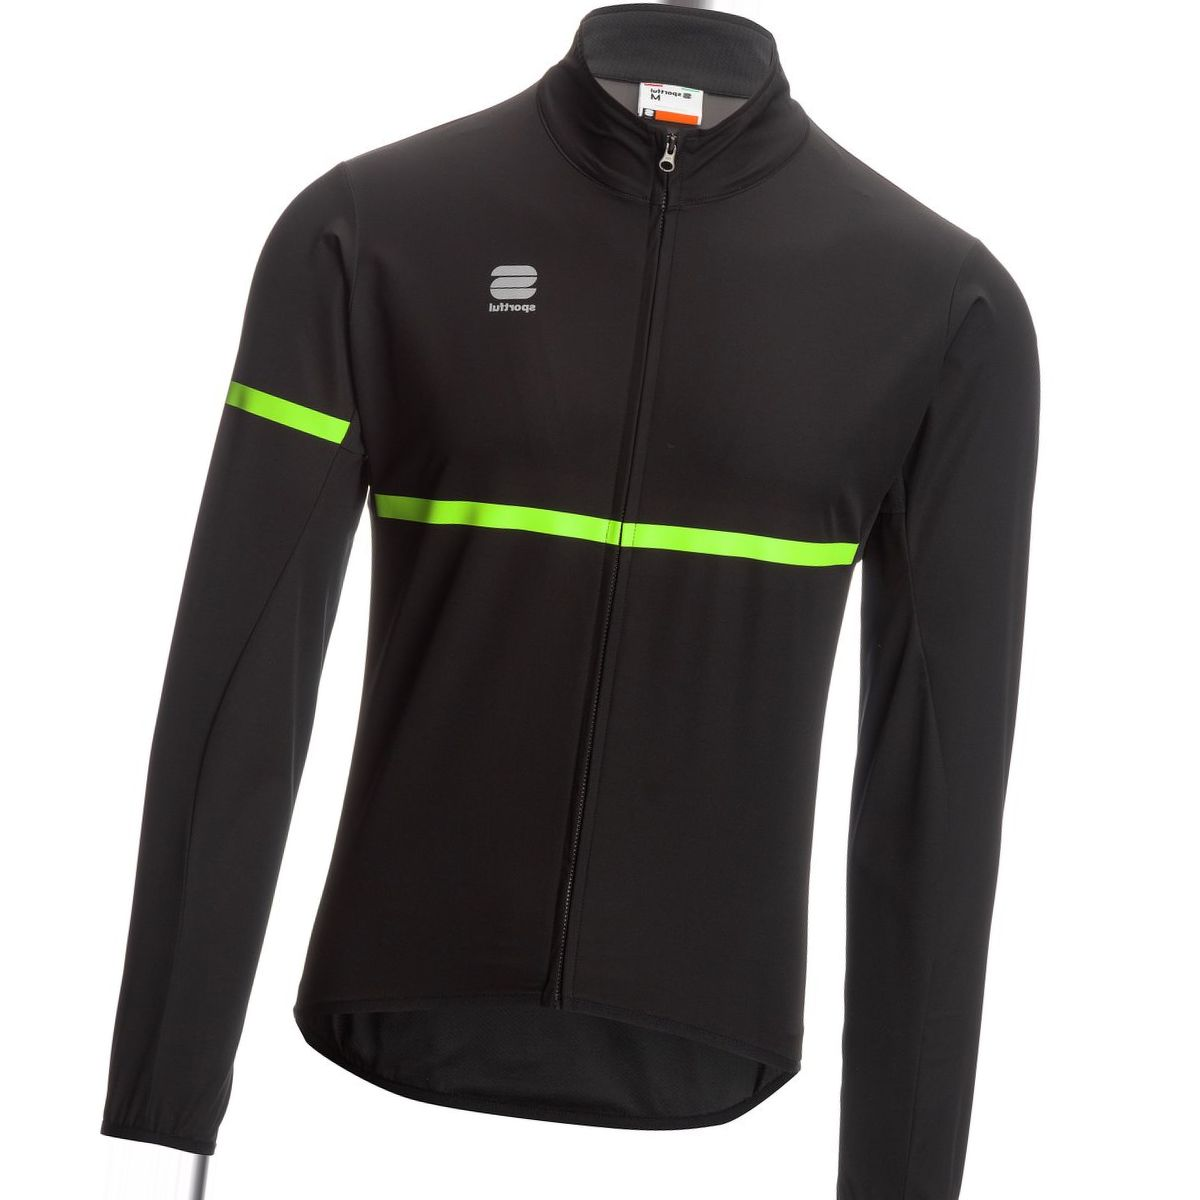 Sportful Giara Jacket - Men's